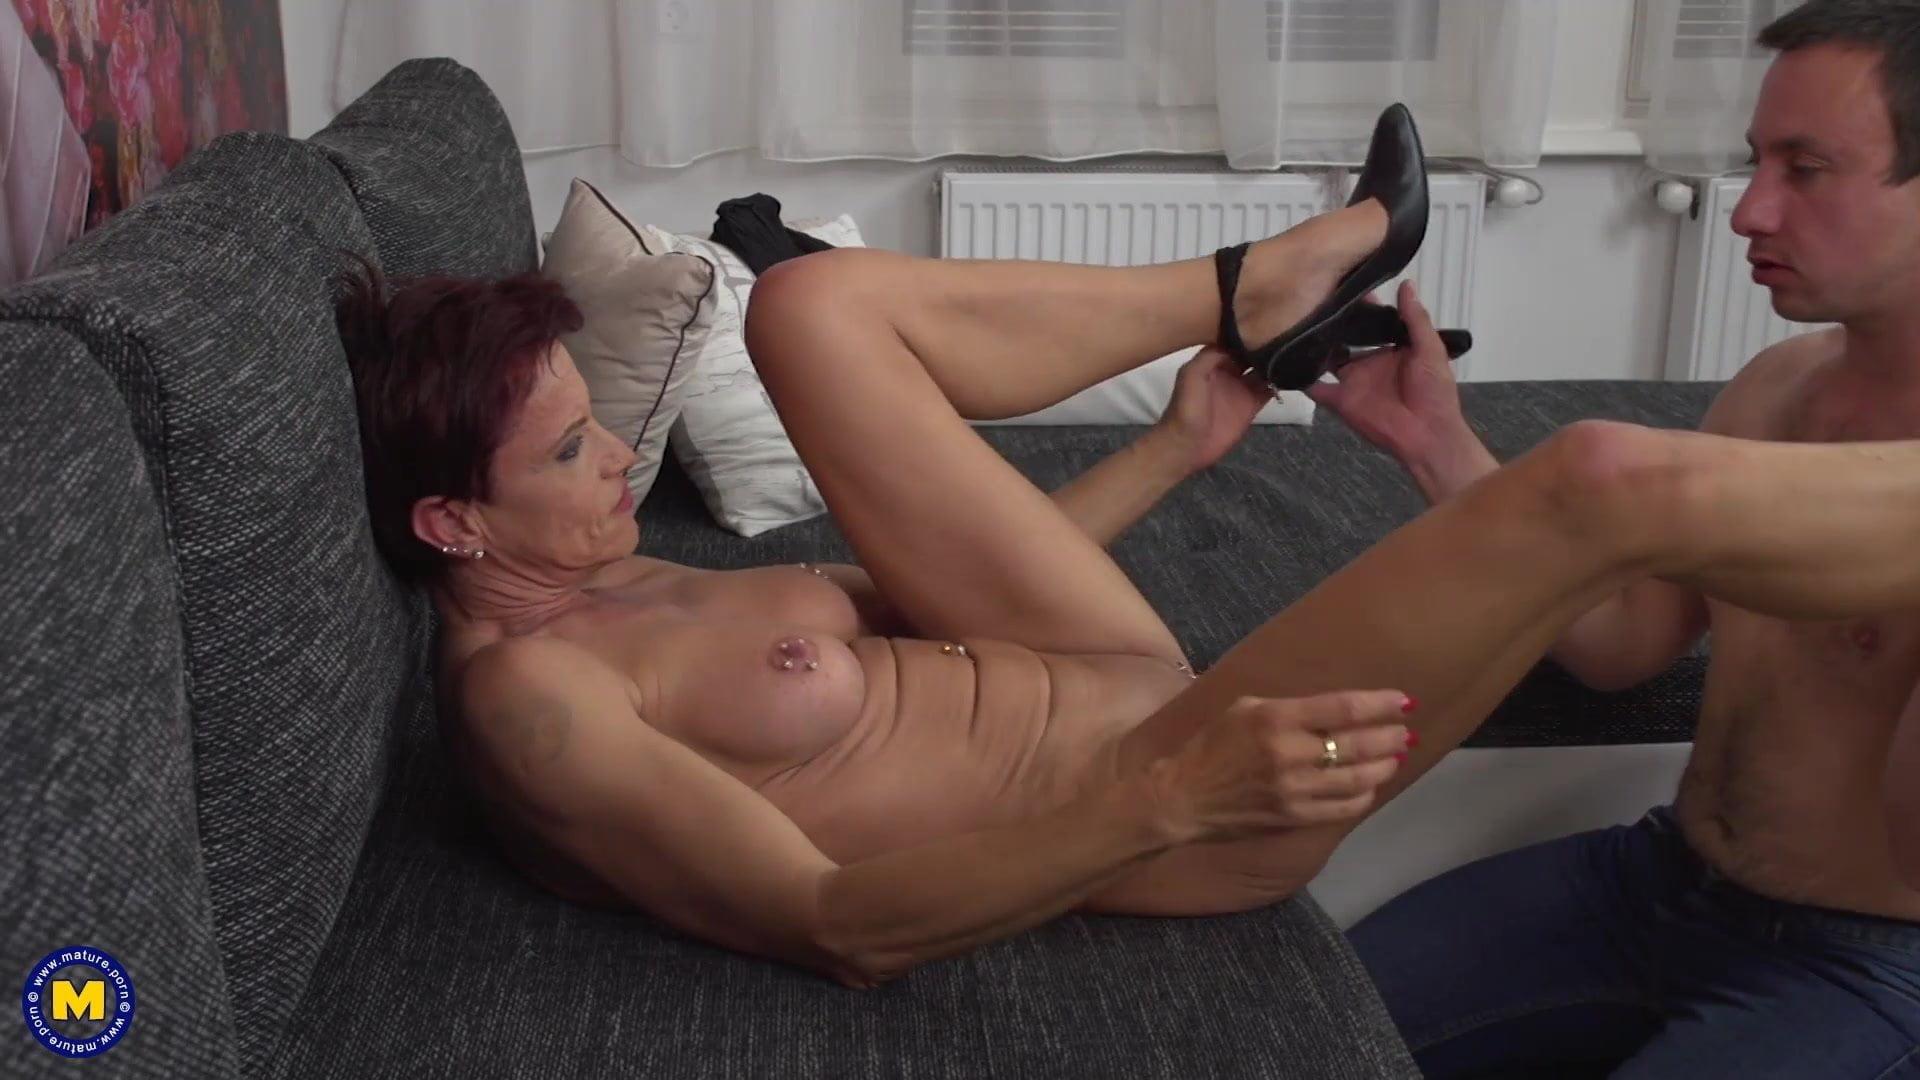 Kinky mature mom gives deep blowjob and fucks boy